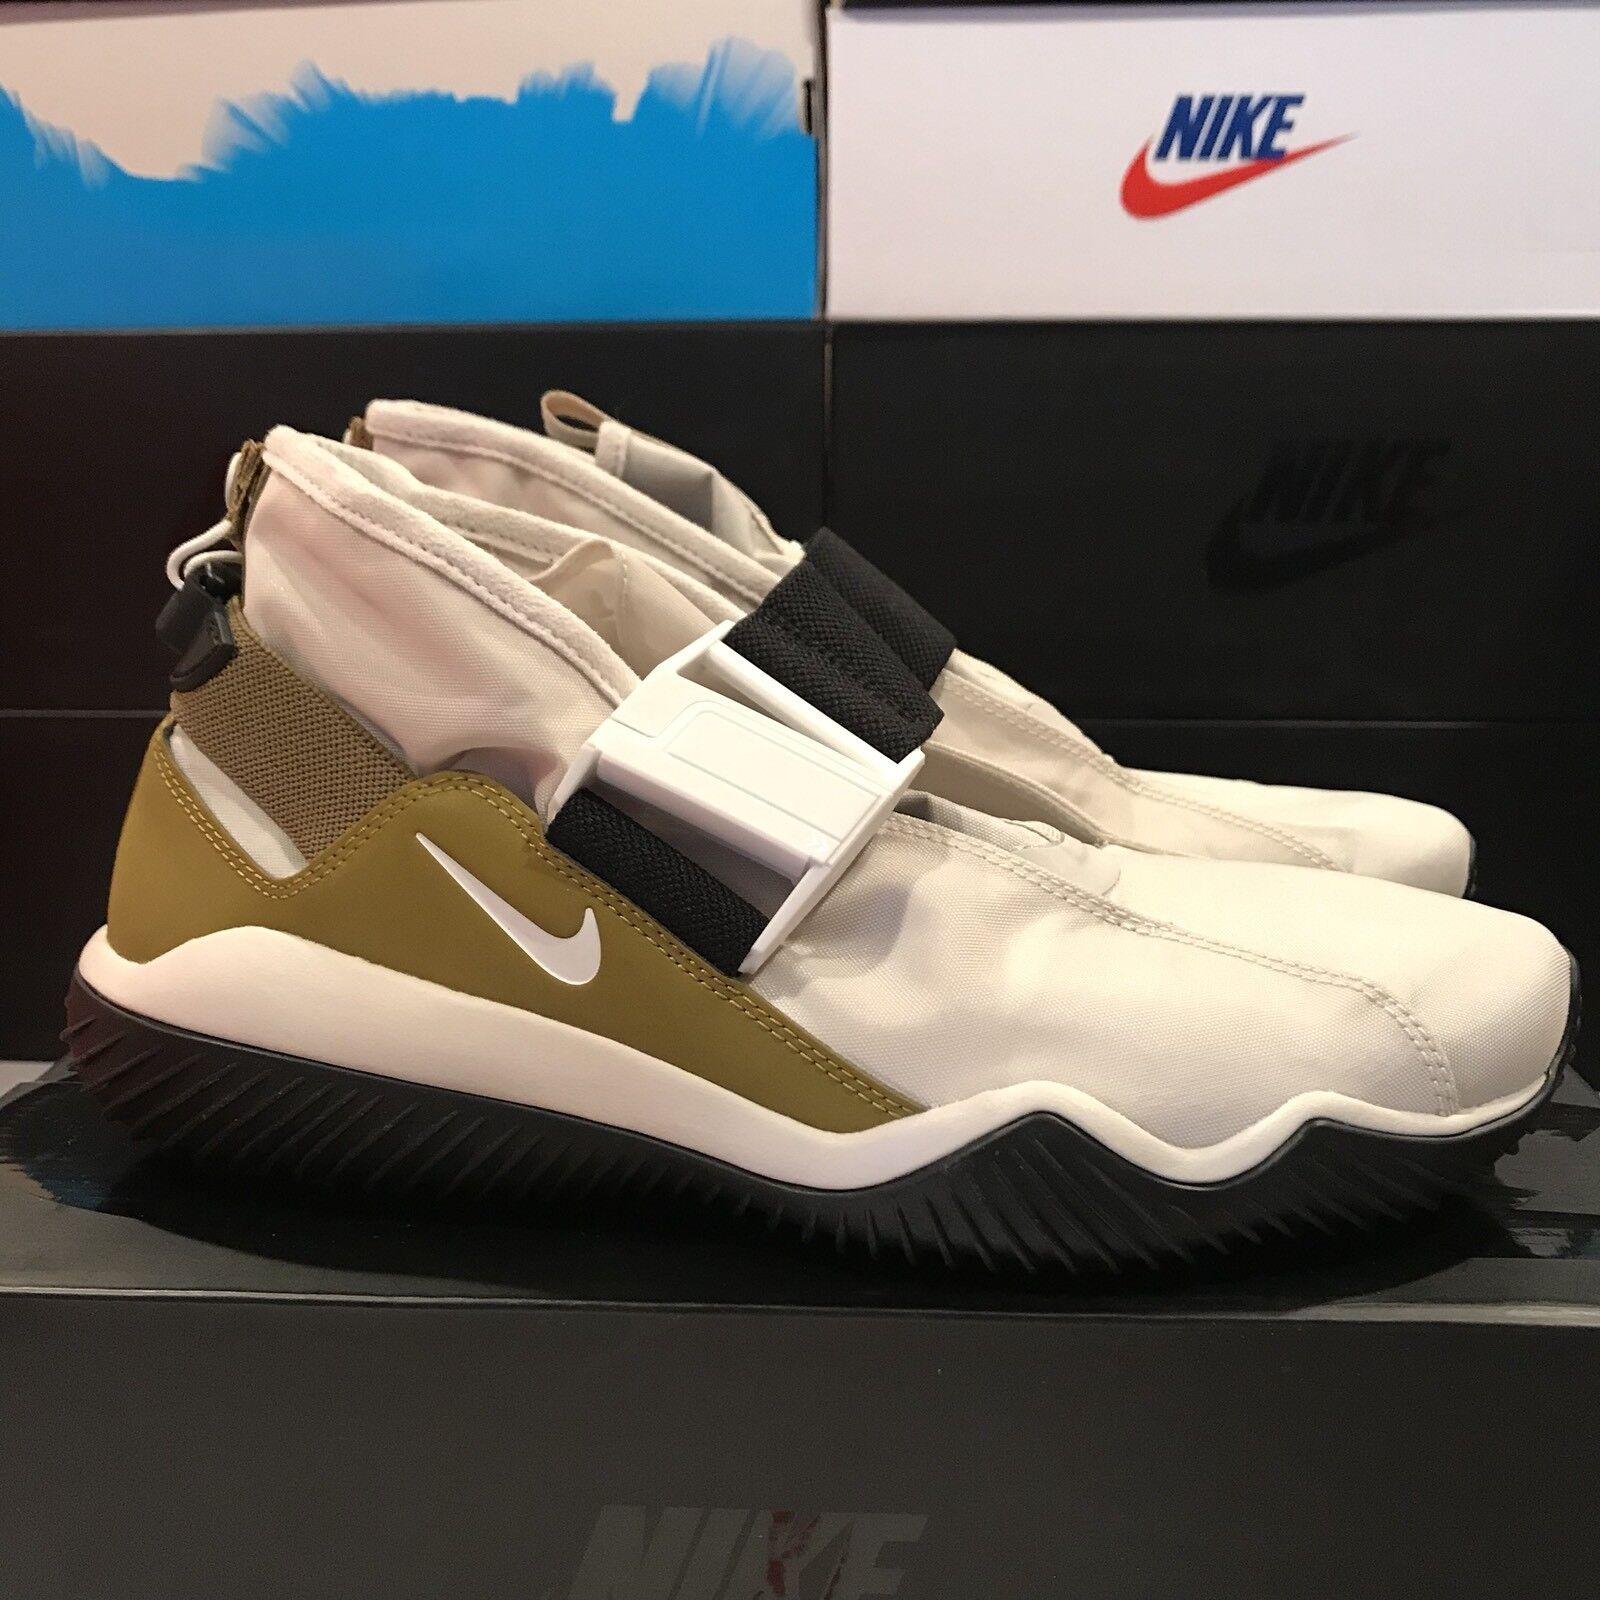 Nike kmtr campione desert luce bianco osso aa0531 002 numero 9